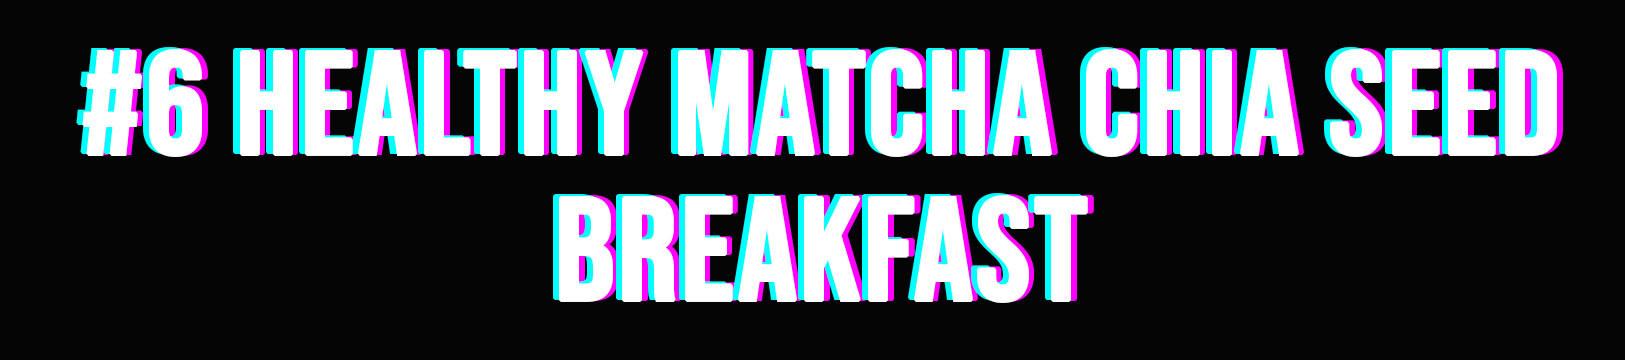 #6 Healthy Matcha Chia Seed Breakfast